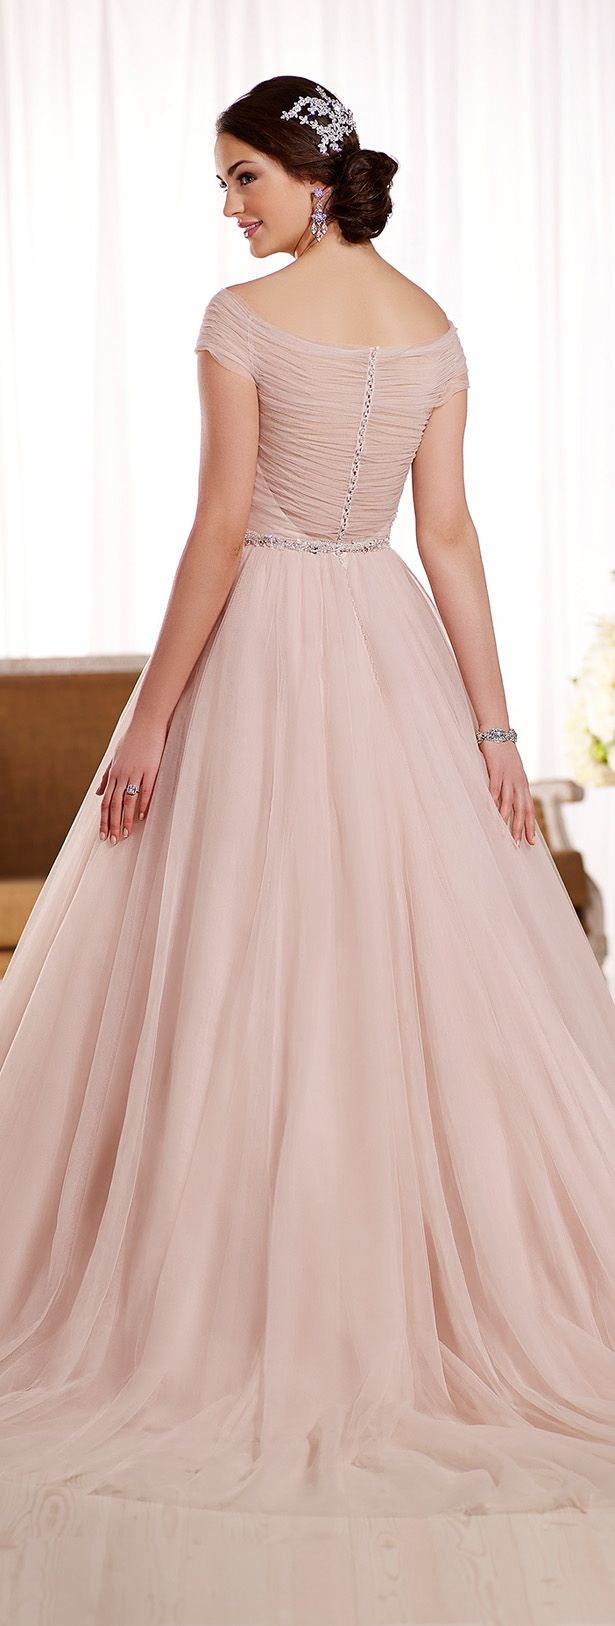 Australia Spring 2016 Bridal Collection